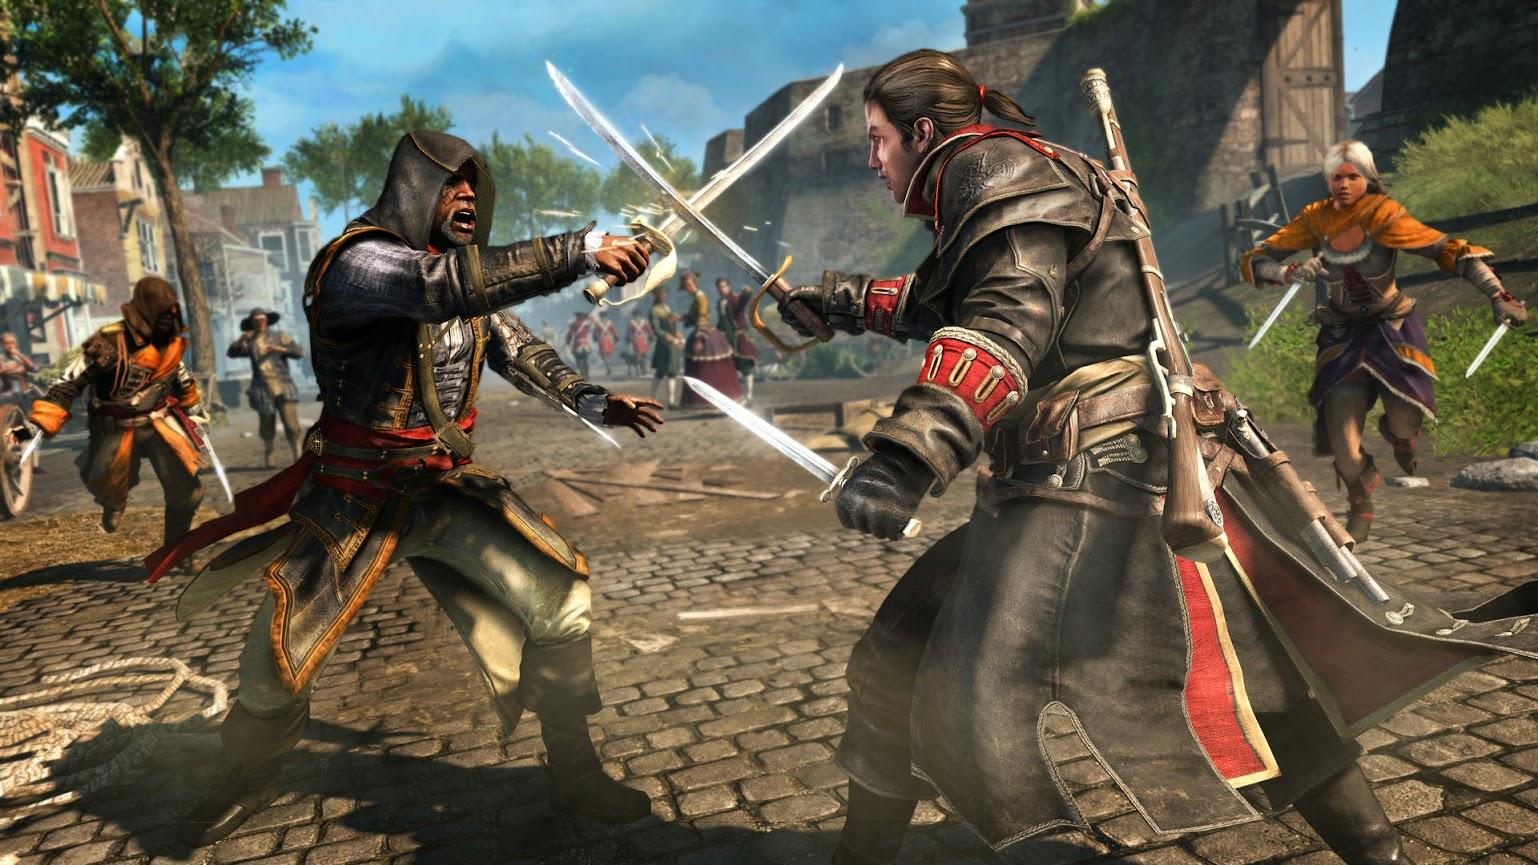 Assassin's Creed Rogue PC codex ftp dvd descarga directa